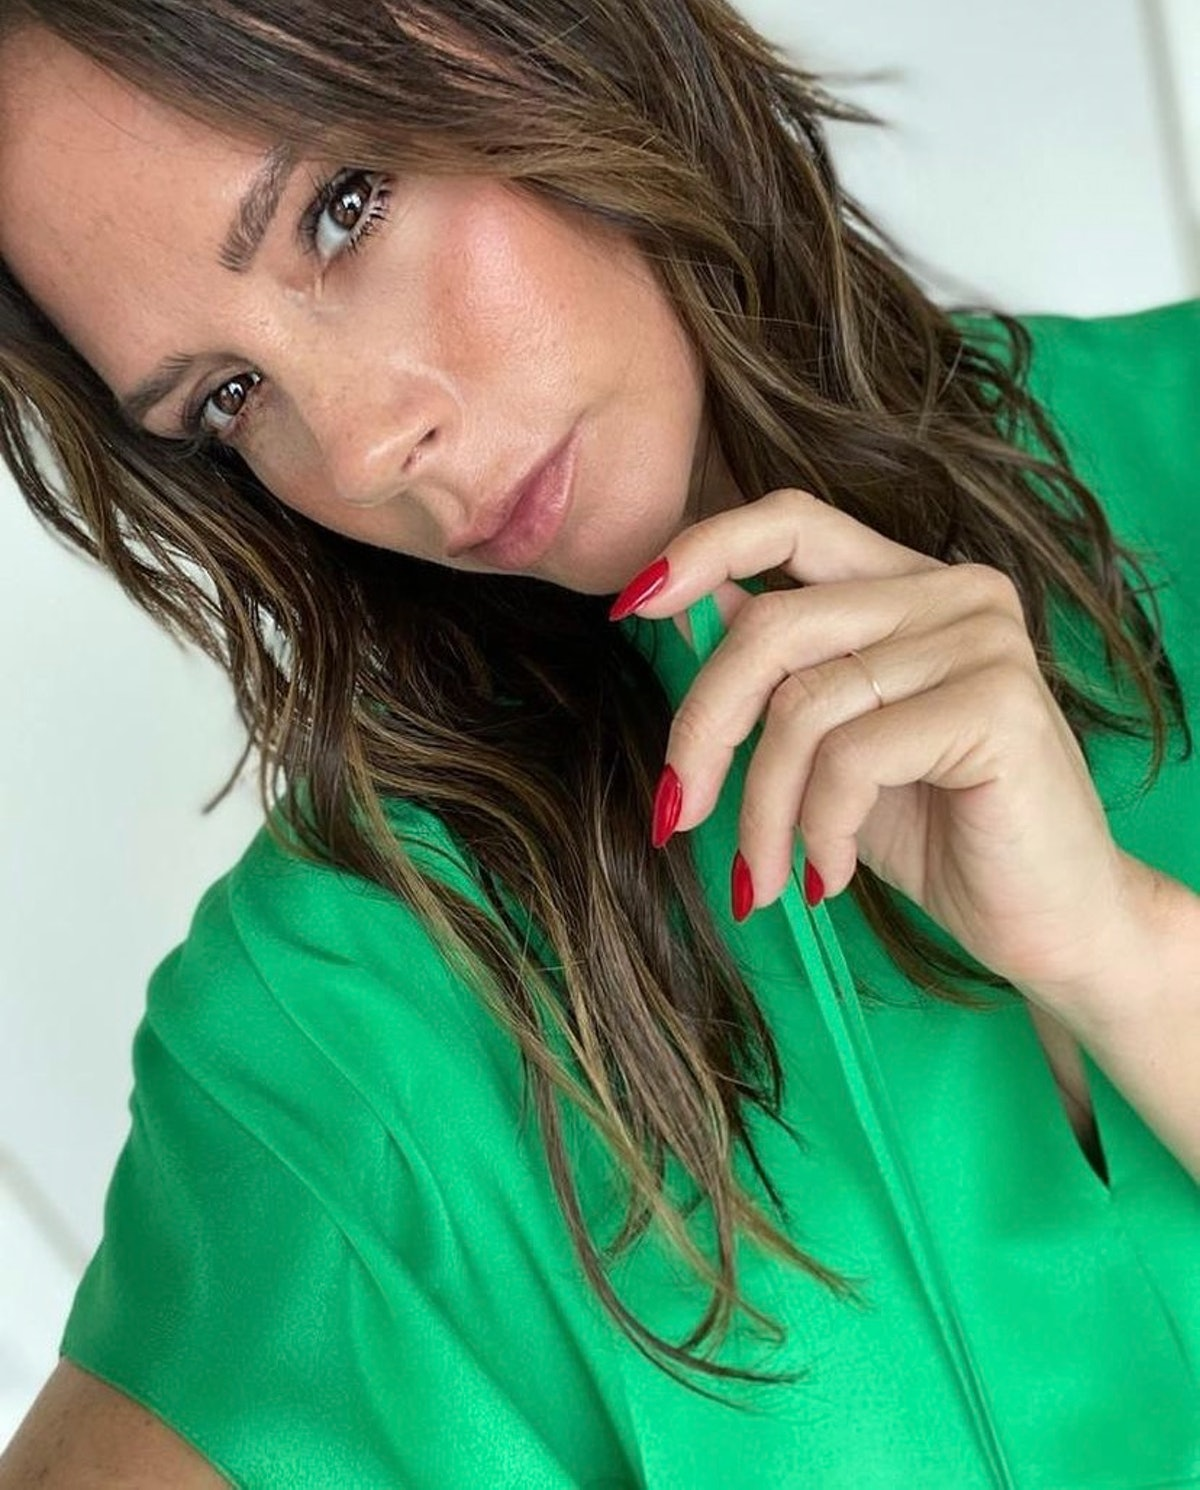 Victoria Beckham in a green blouse.